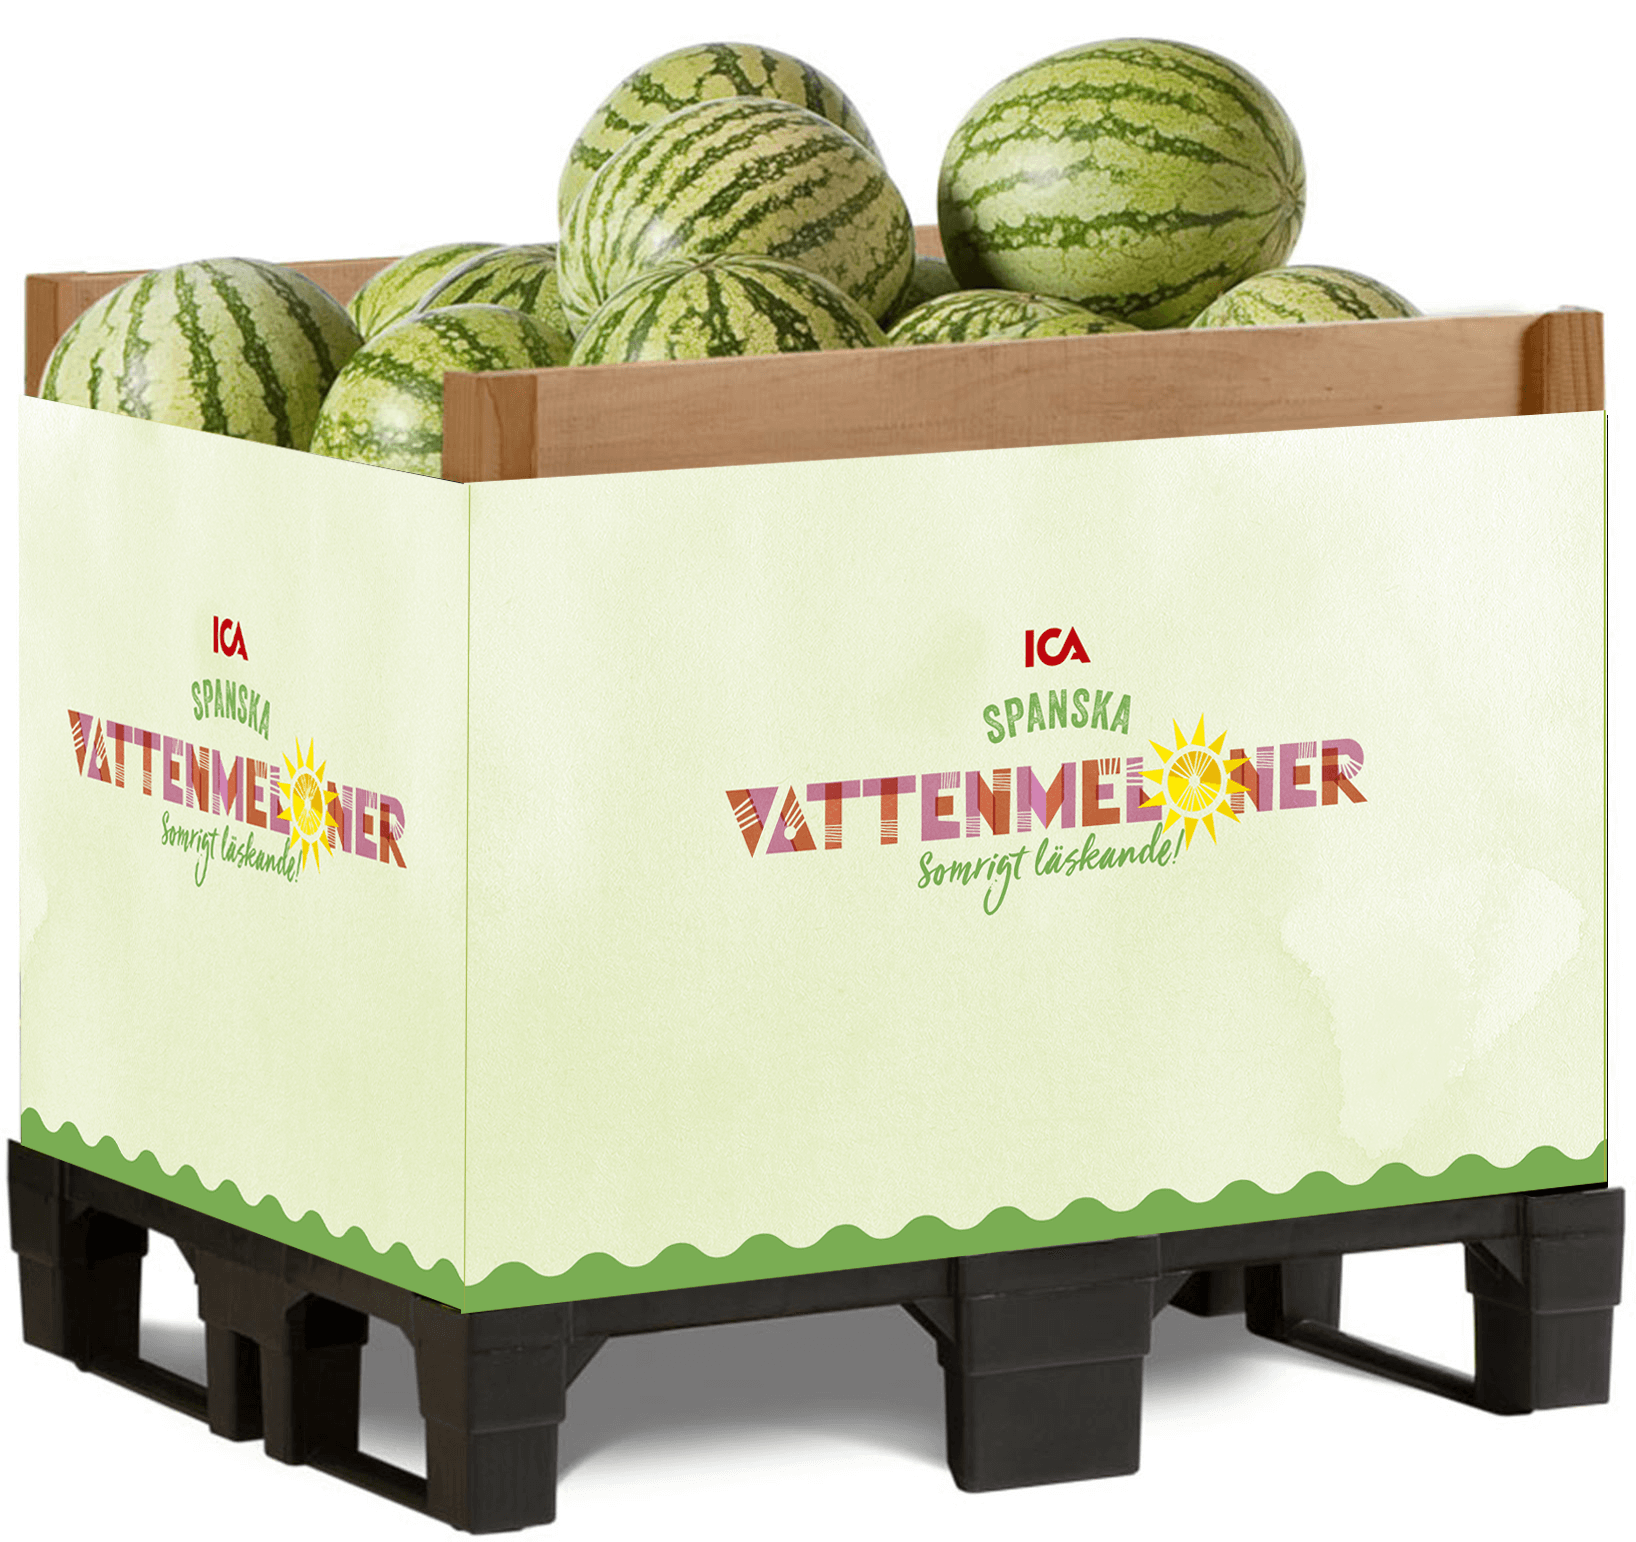 g70 melon